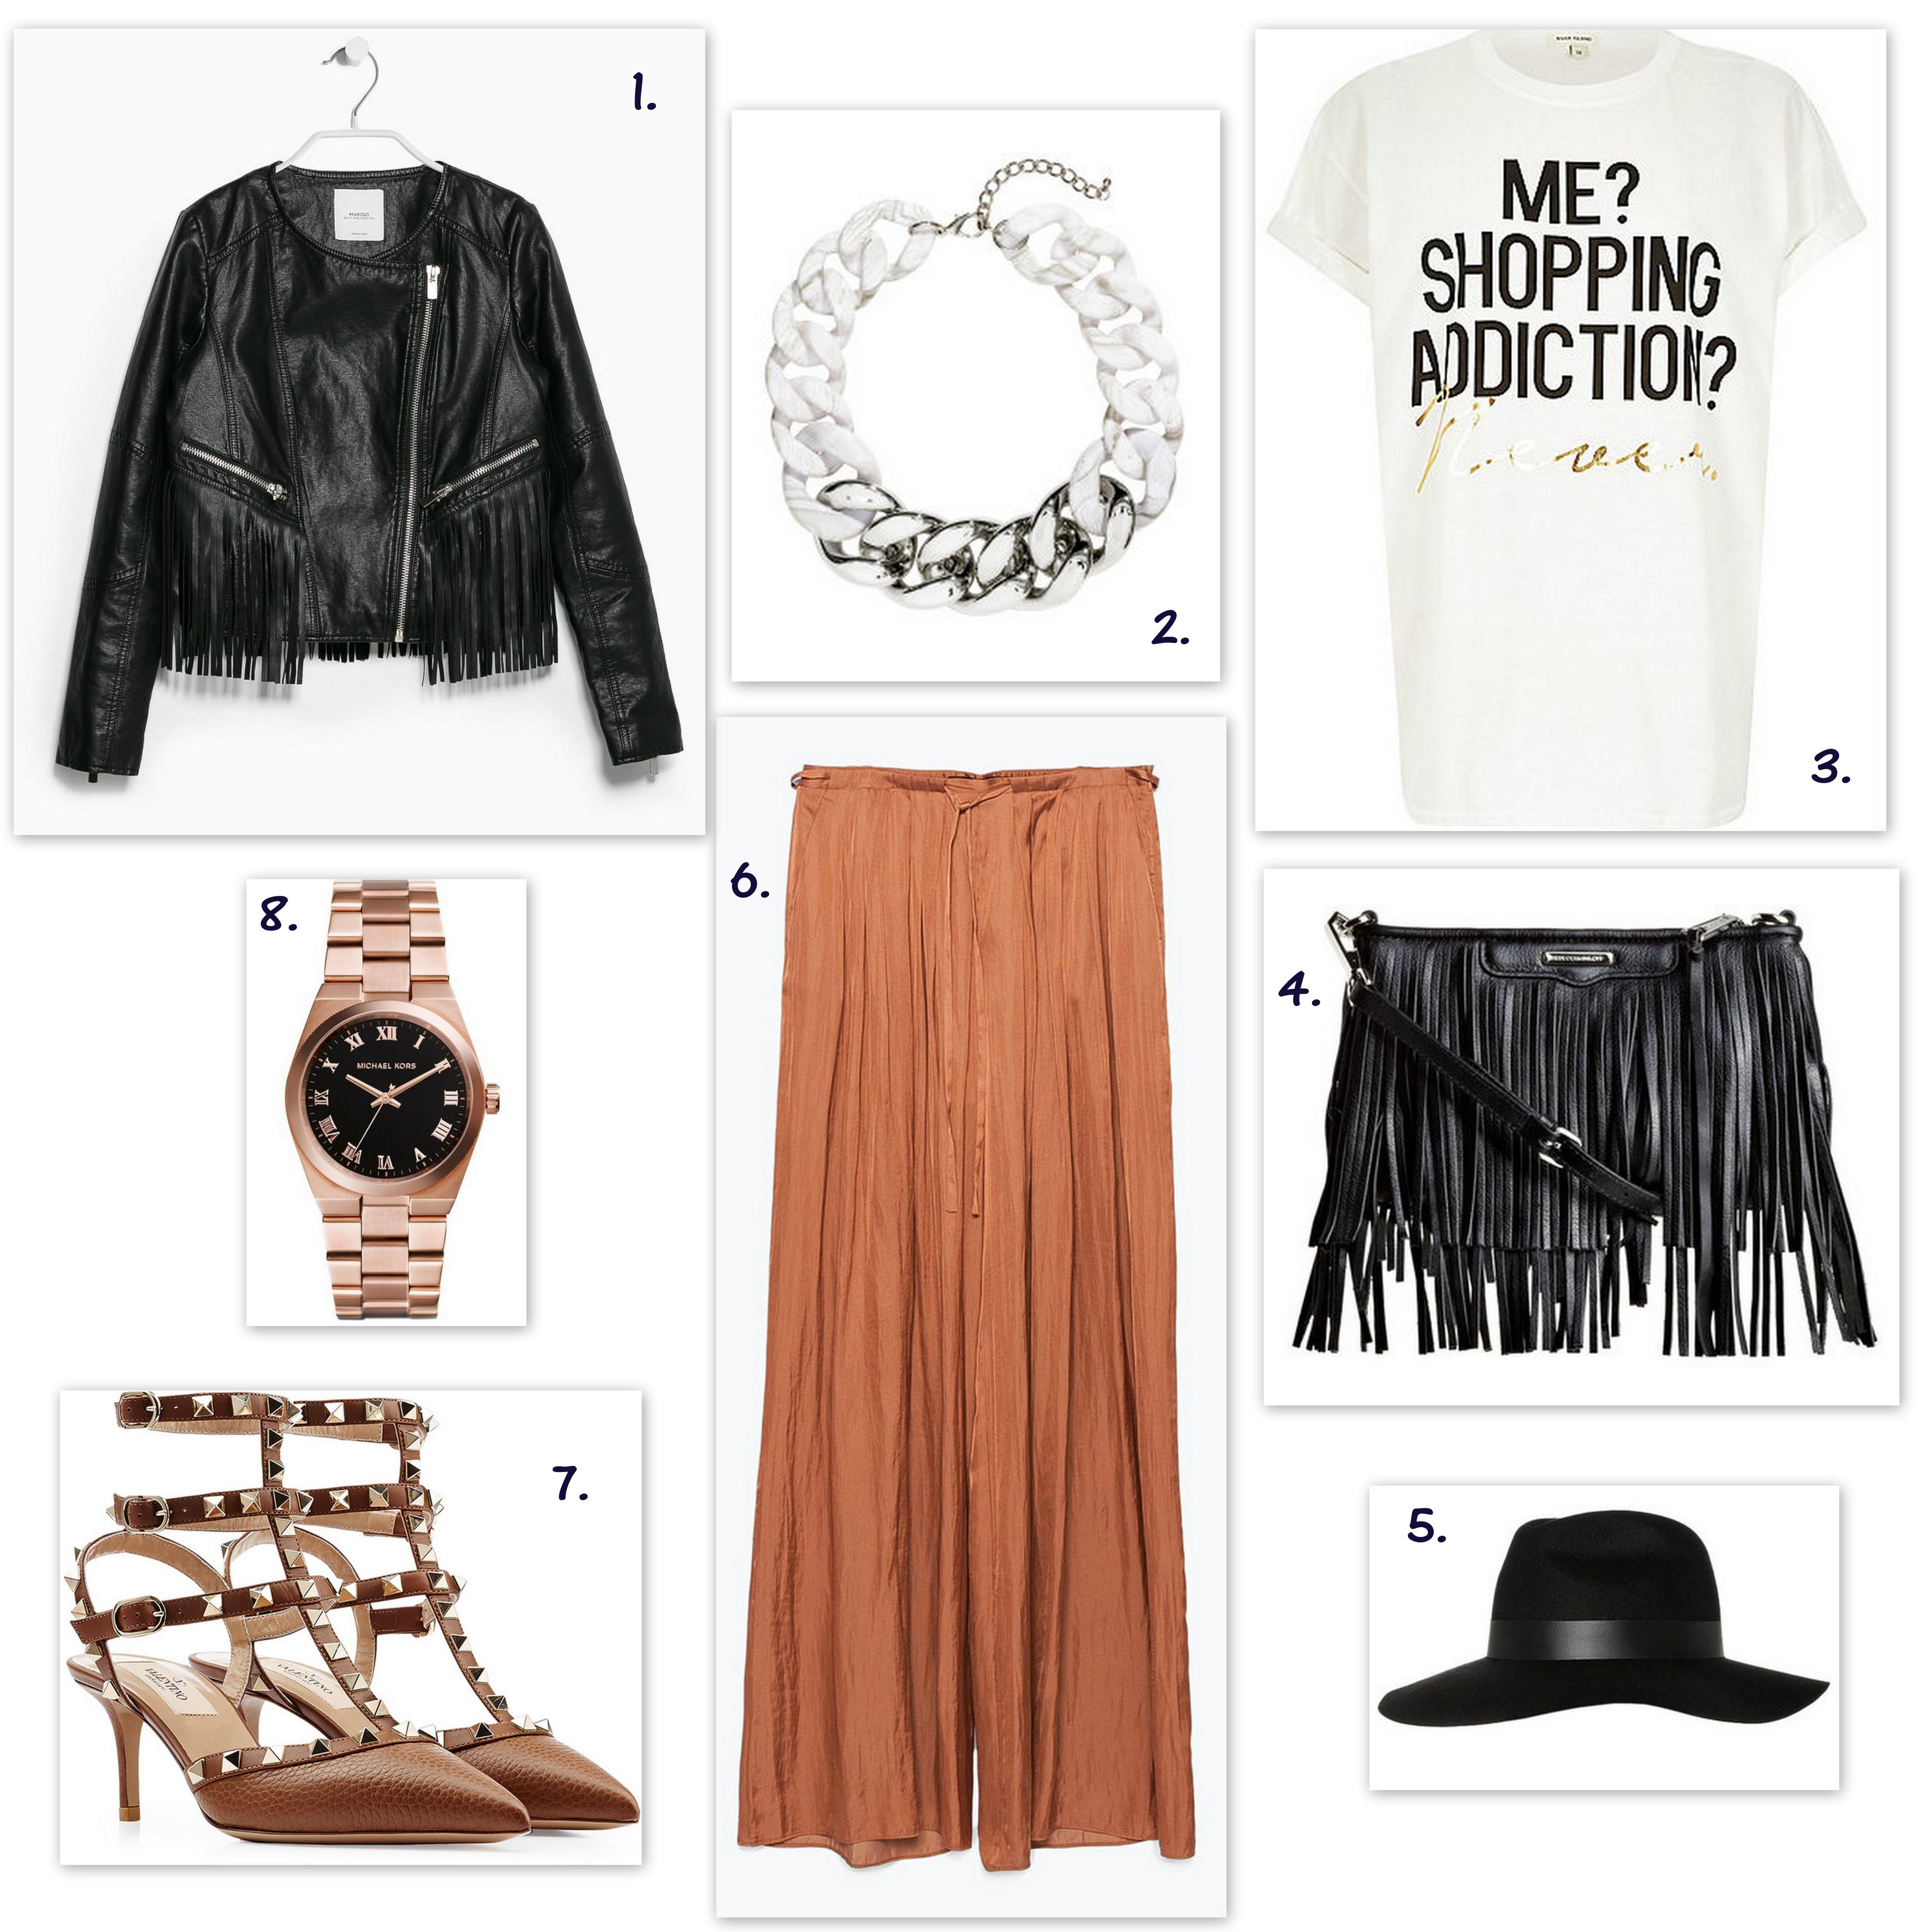 Fashion_Shopping_Collage_Wishlist_Week_12